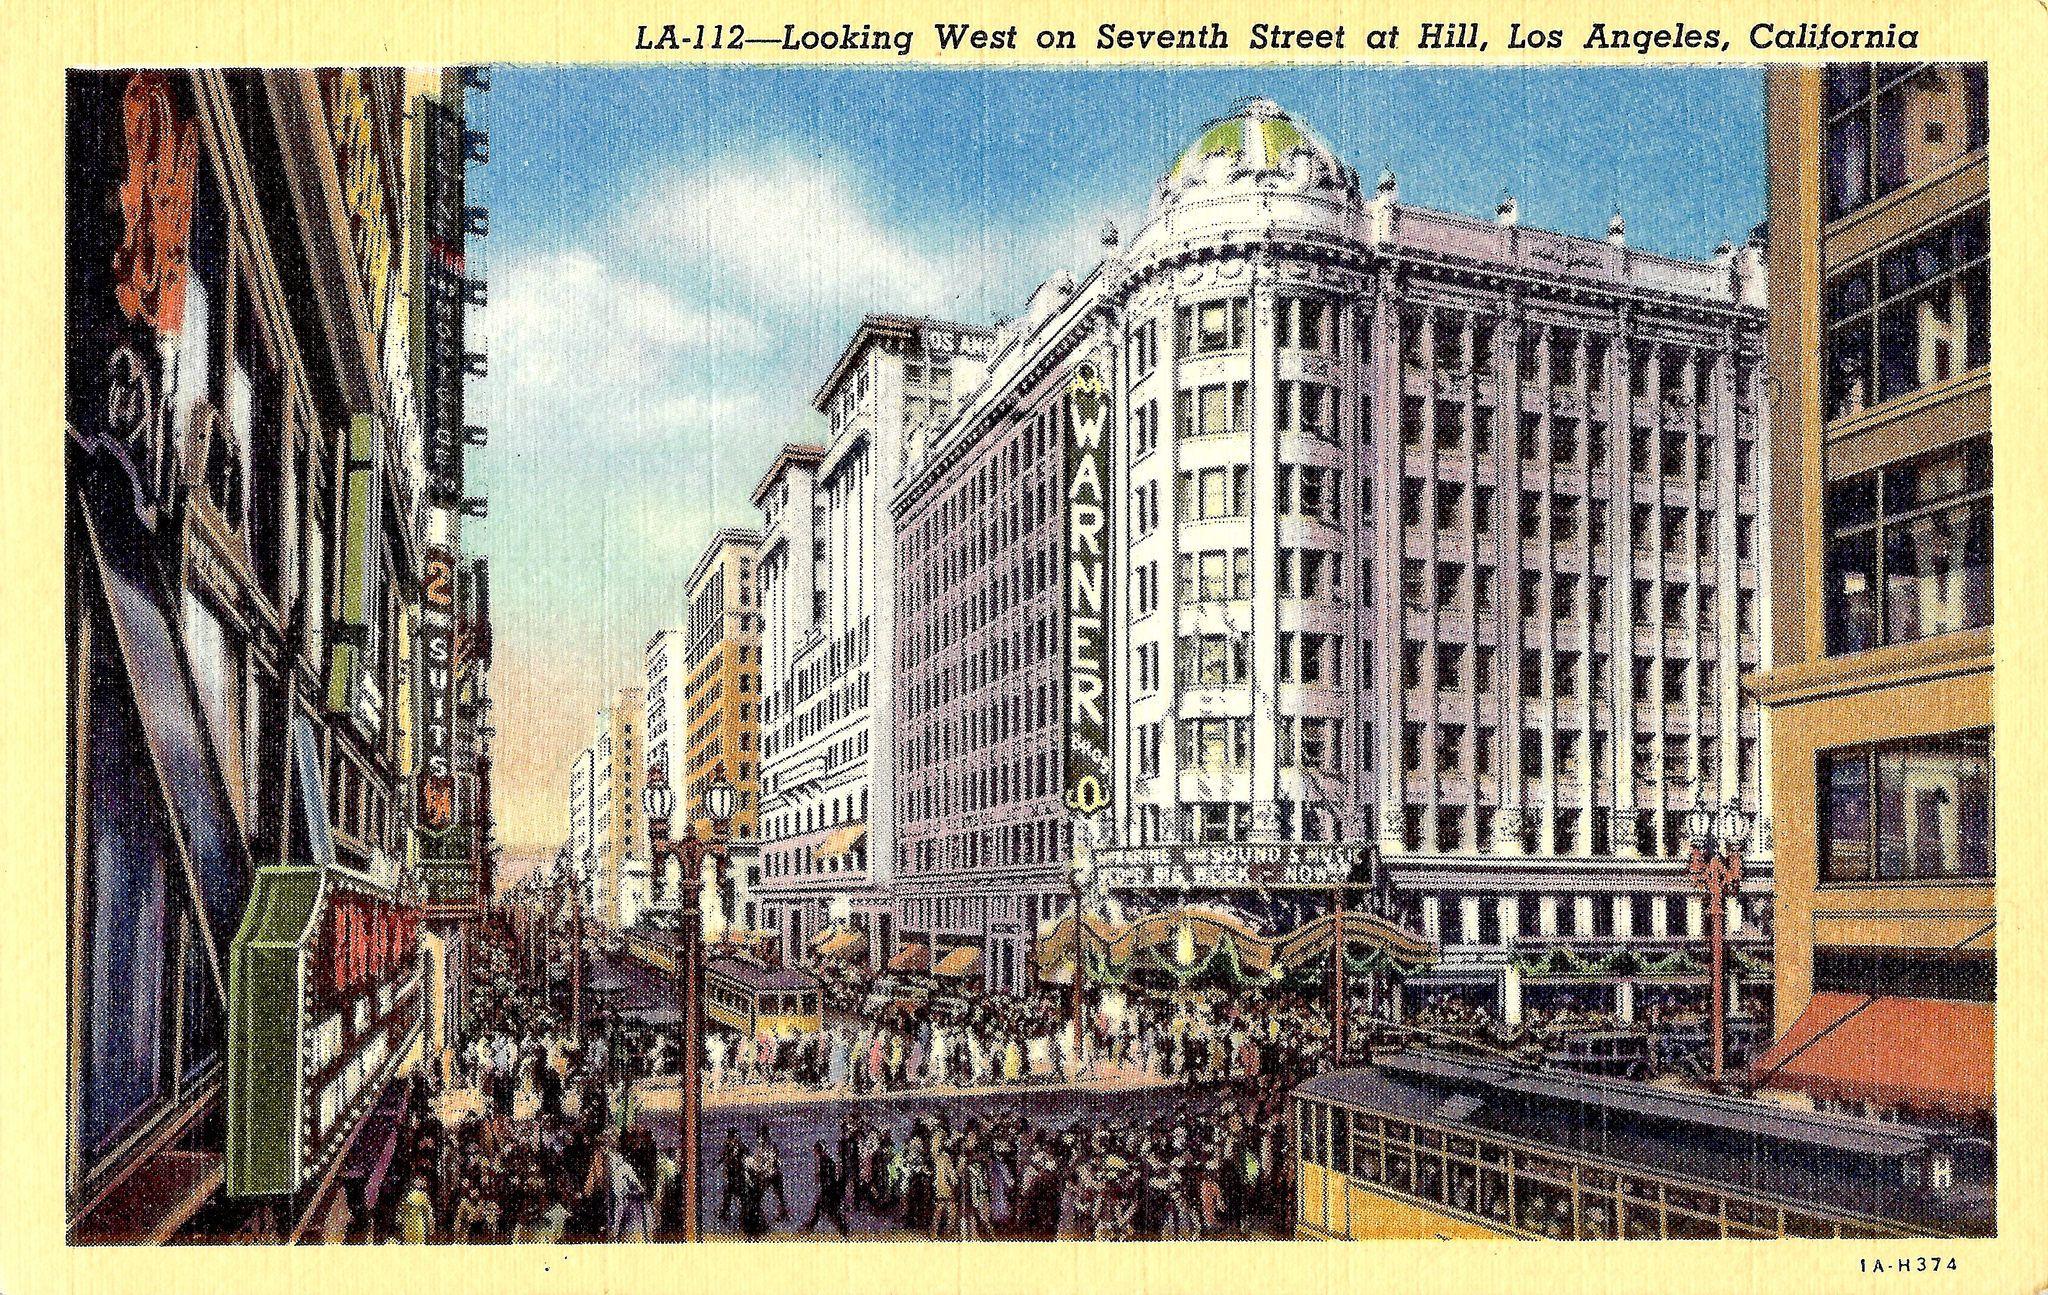 Vintage Postcard Los Angeles Walking Tour Los Angeles History Downtown Los Angeles